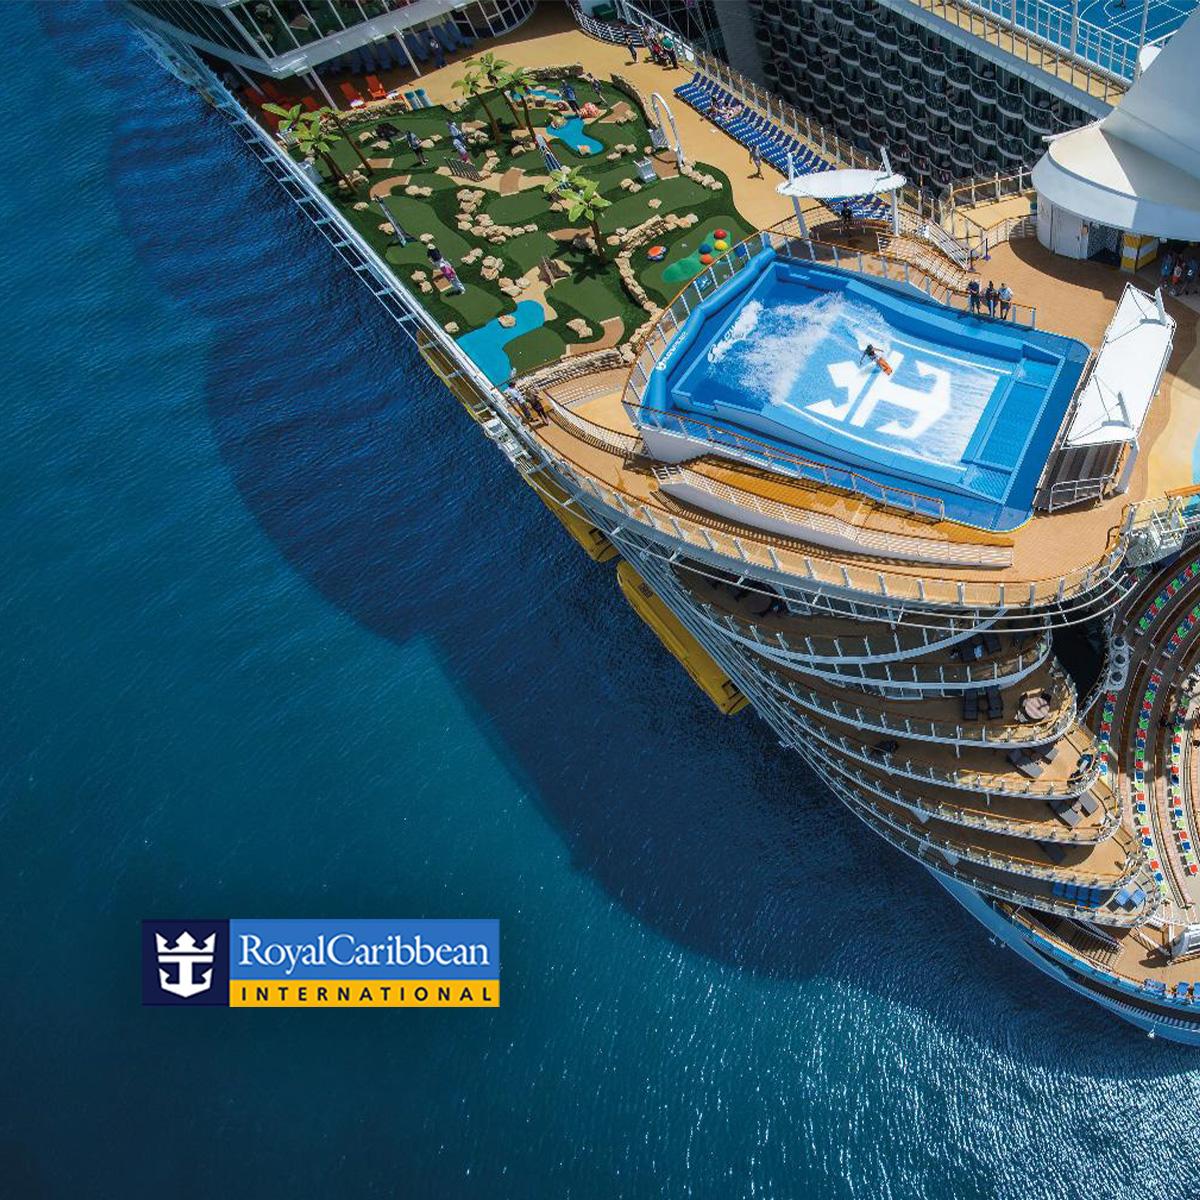 Royal Caribbean | Digitally Transforming the Sailor Experience